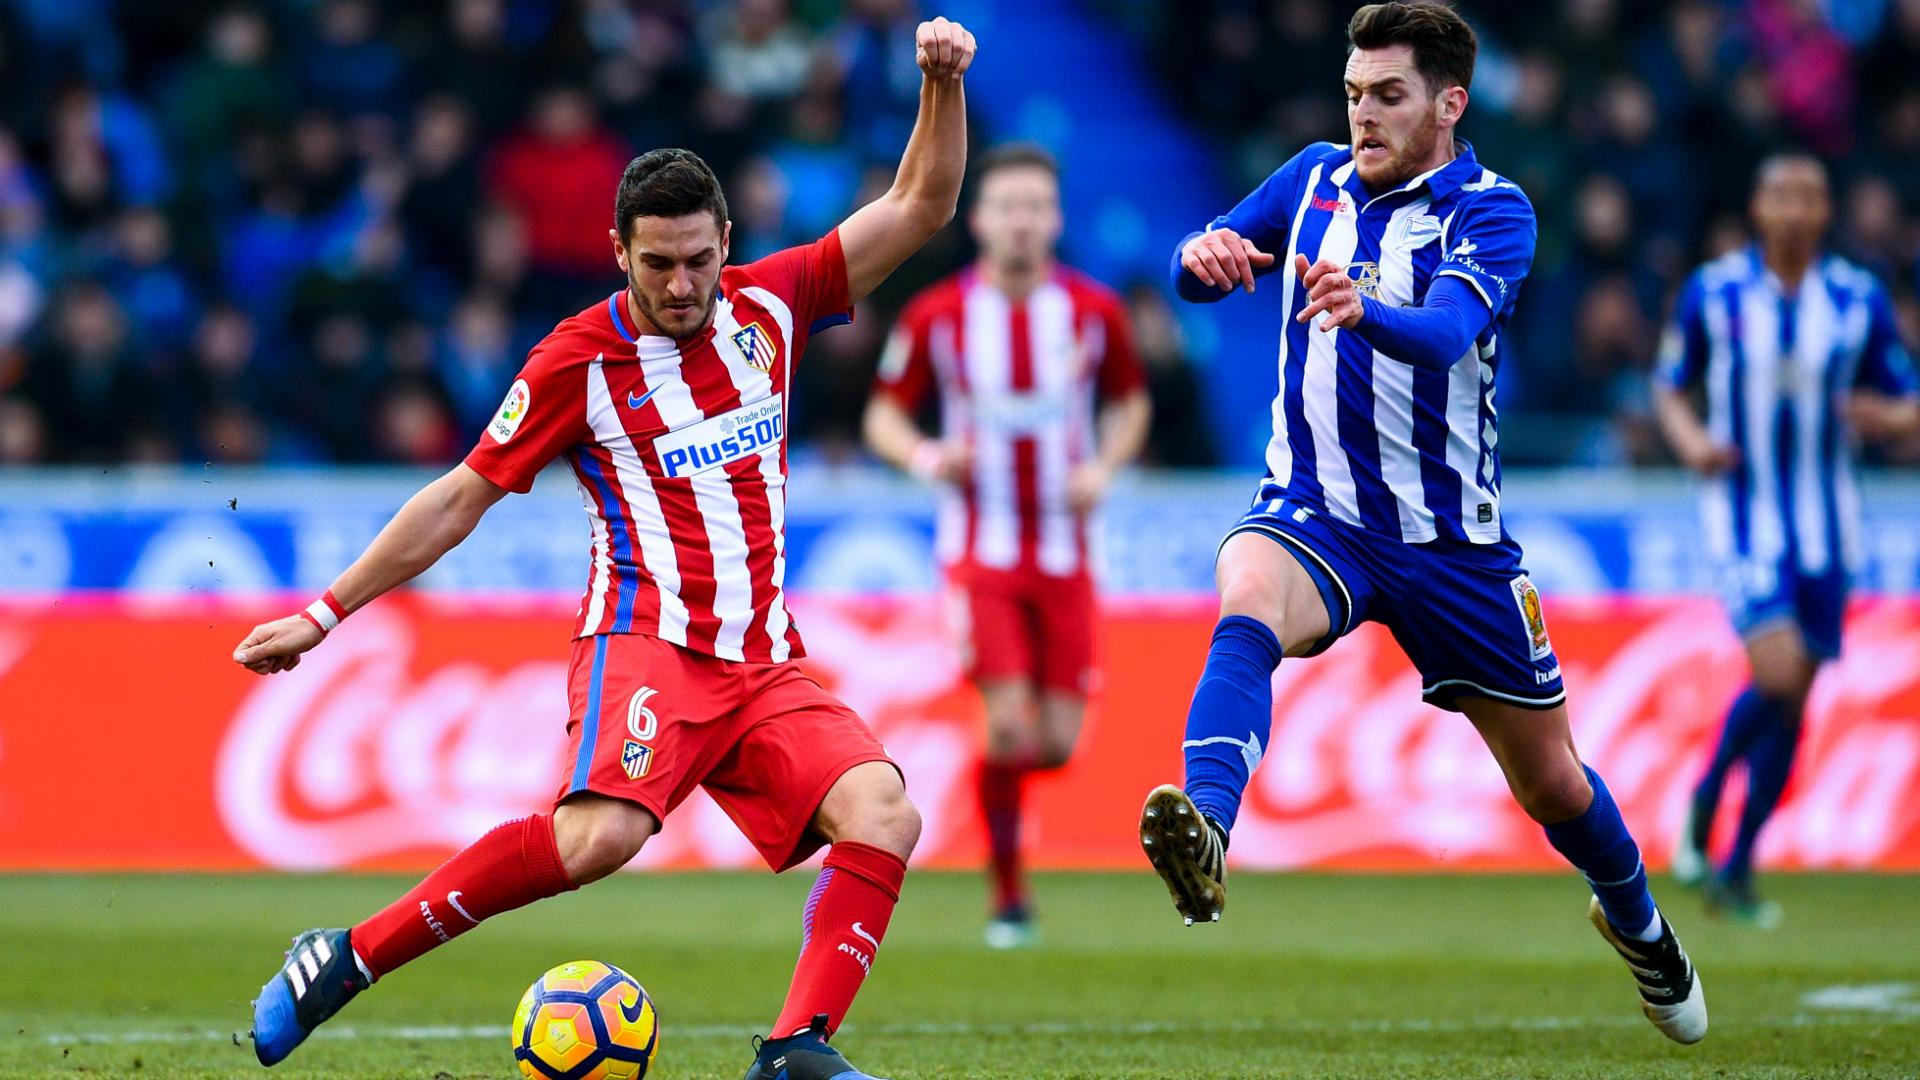 Atletico loses on Morata debut, Real Madrid beats Alaves  |Atlético Madrid--alavés